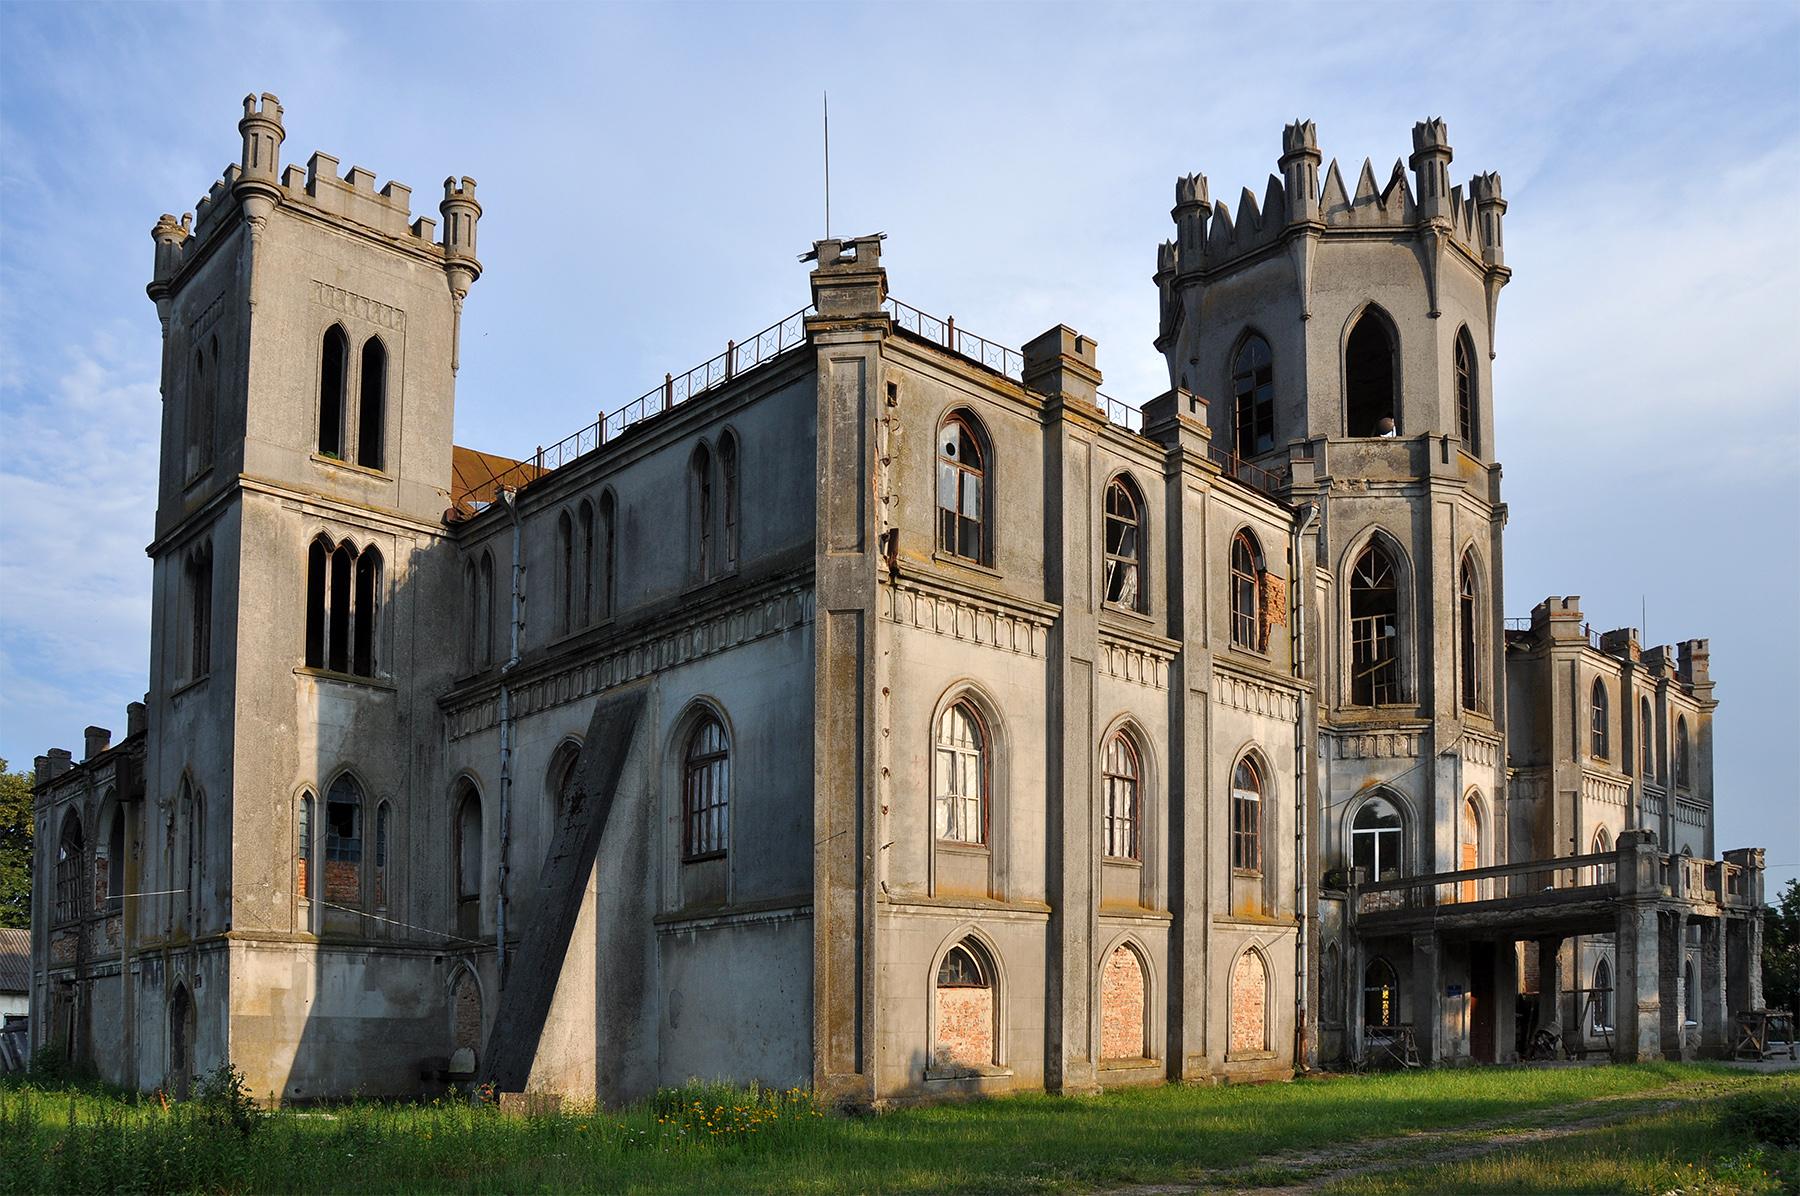 File:Chervone Palace RB.jpg - Wikimedia Commons